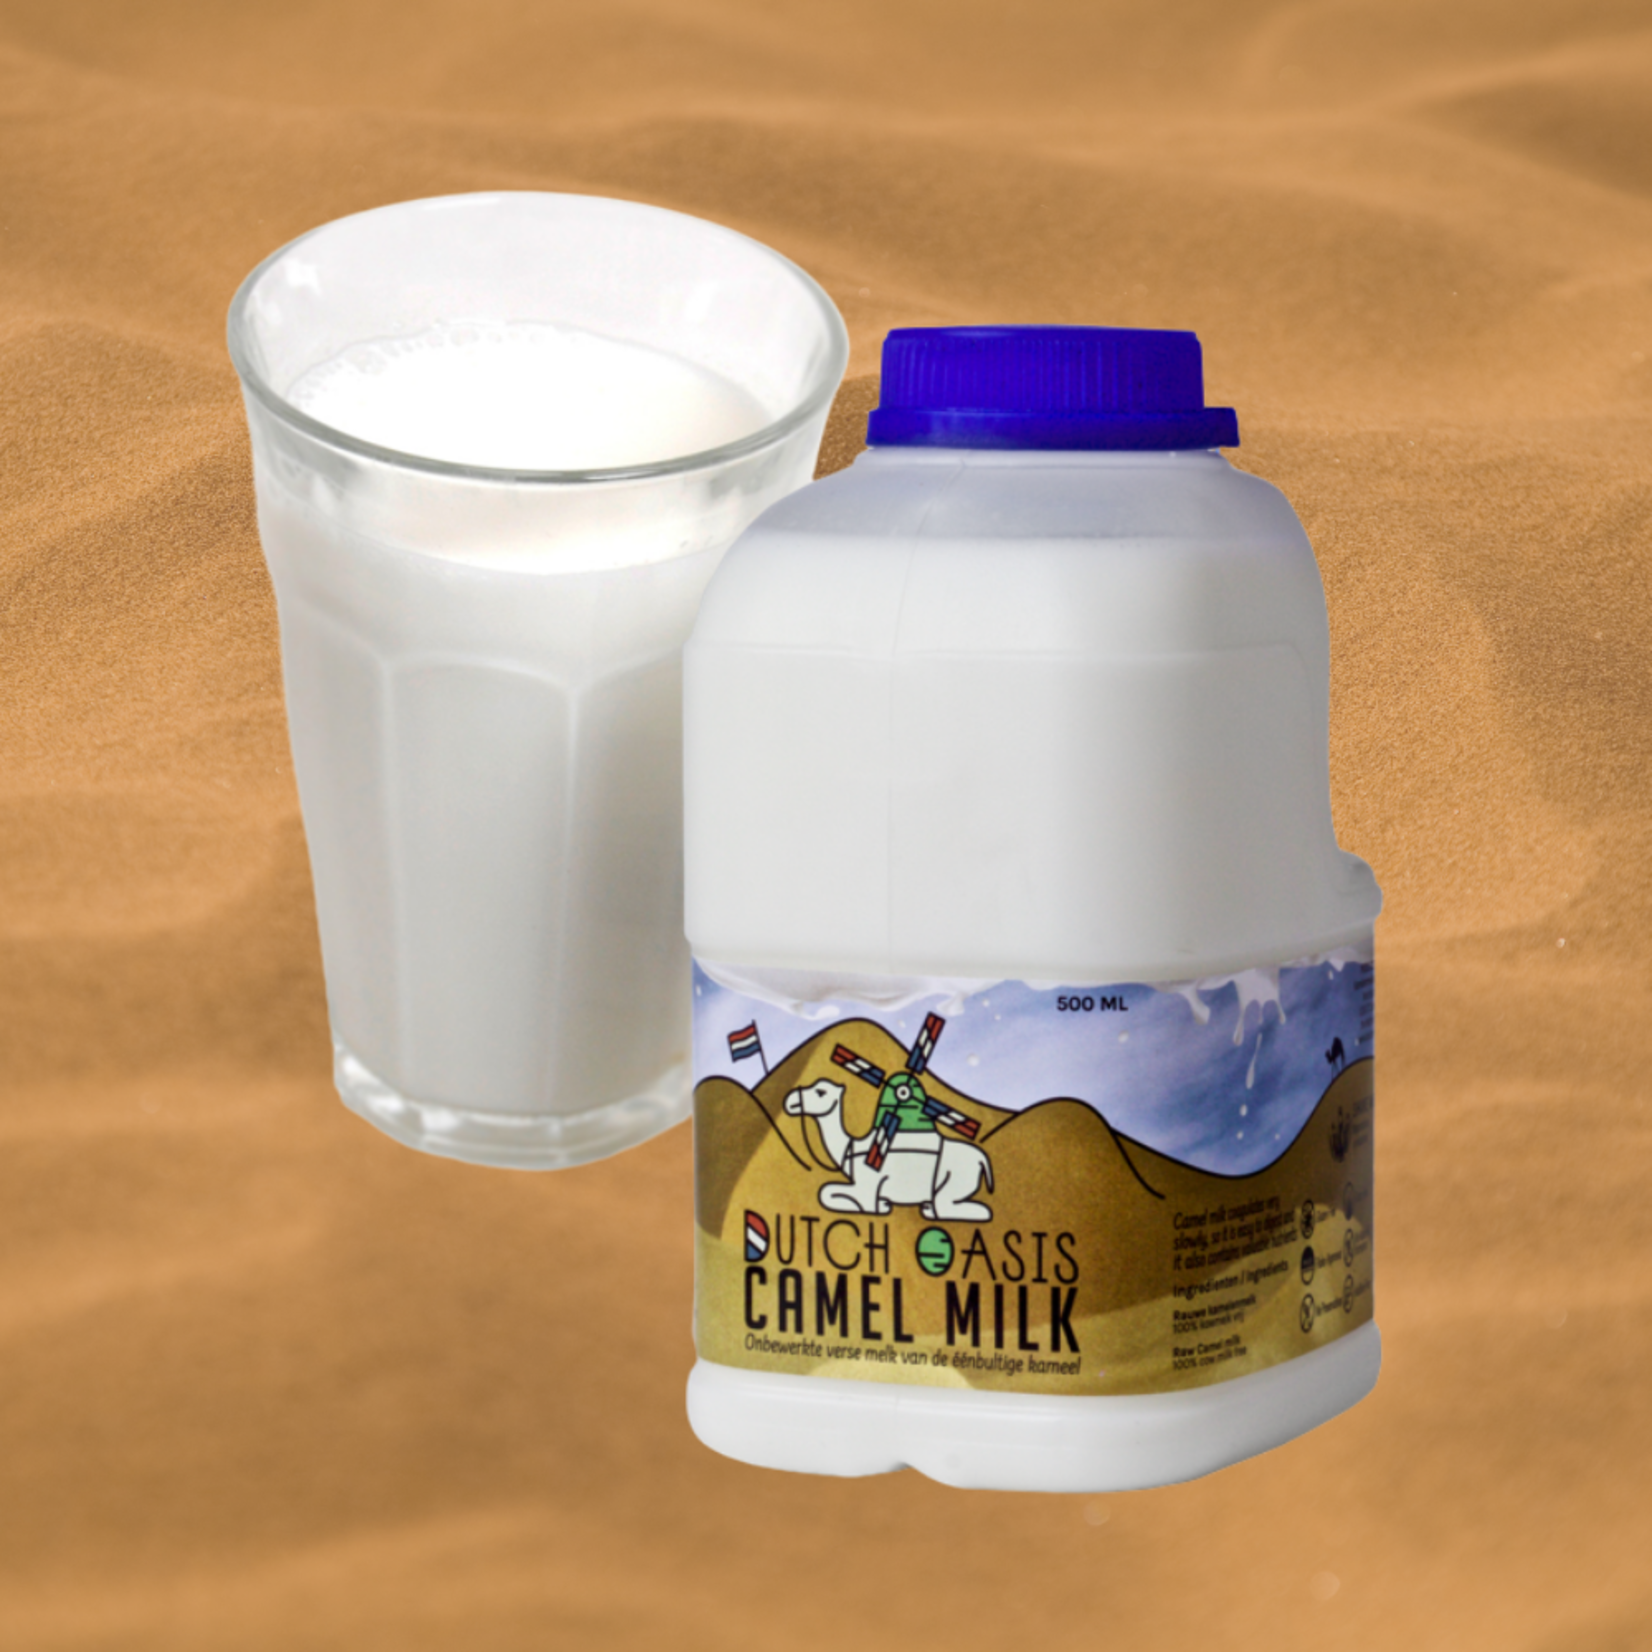 Dutch Oasis 7 bottles (á 500ml) frozen and raw camel milk